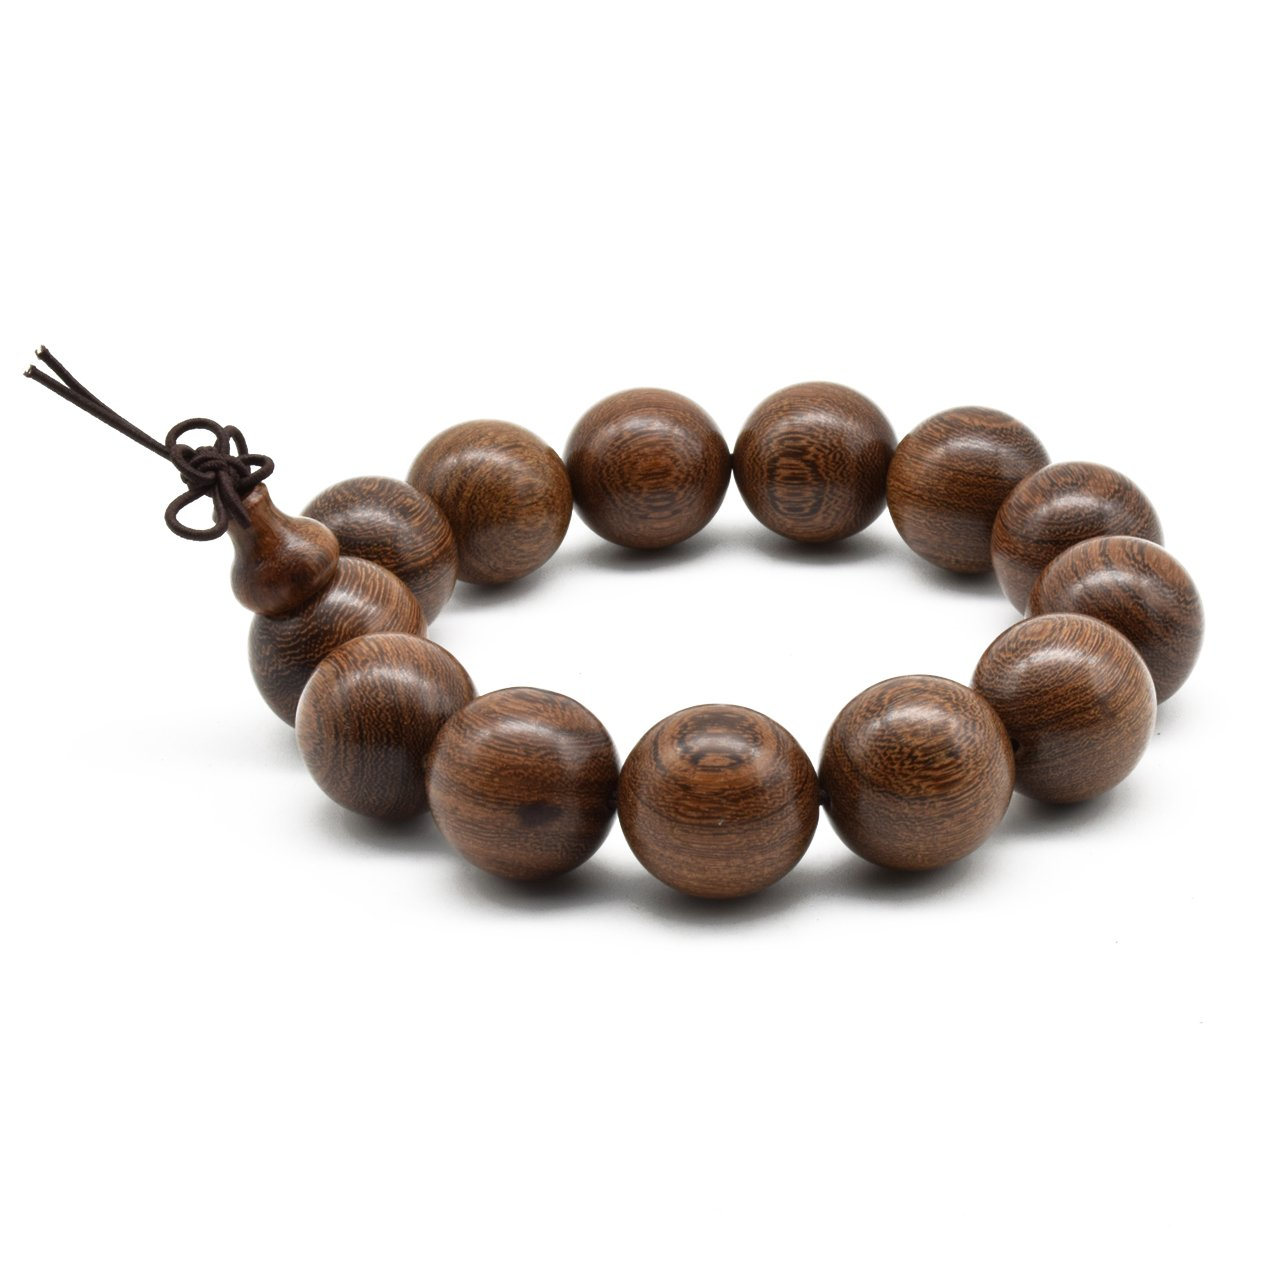 Zen Dear Unisex Natural Silkwood Tibetan Buddhism Meditation Prayer Bead Necklace Japa Mala Beads Bracelets (18mm x 13 Beads)